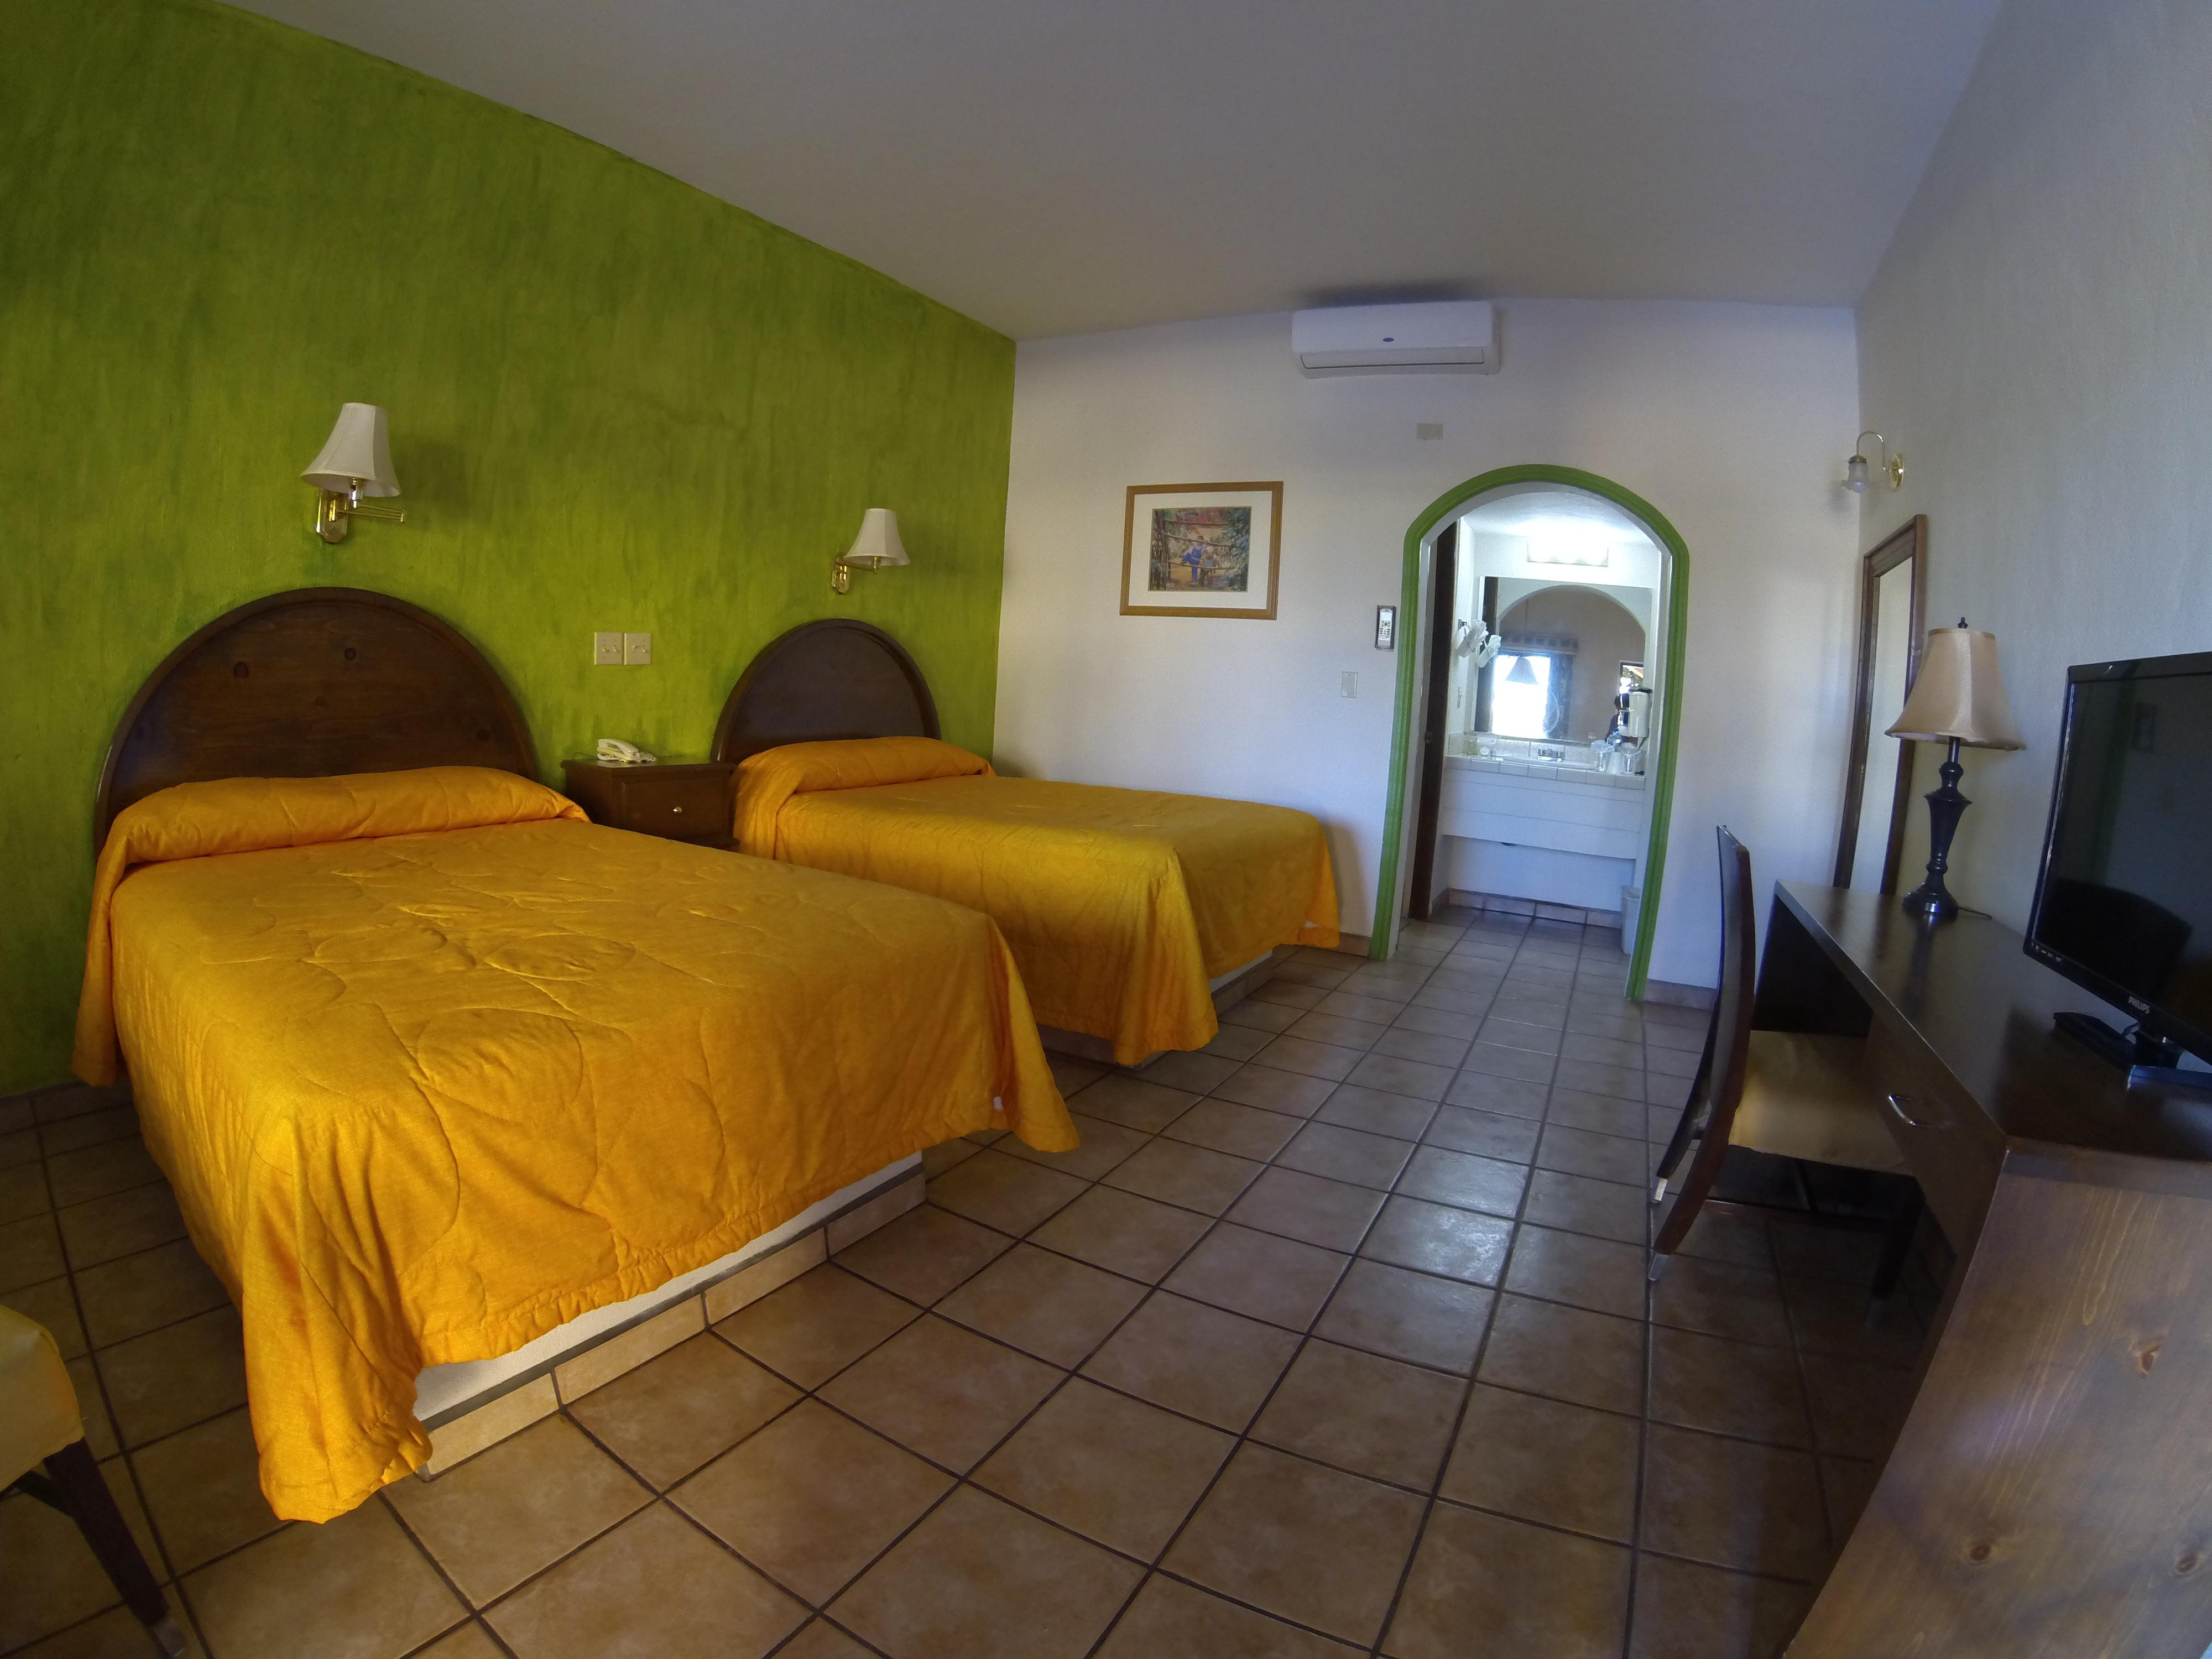 Hacienda Suites Loreto, Comondú